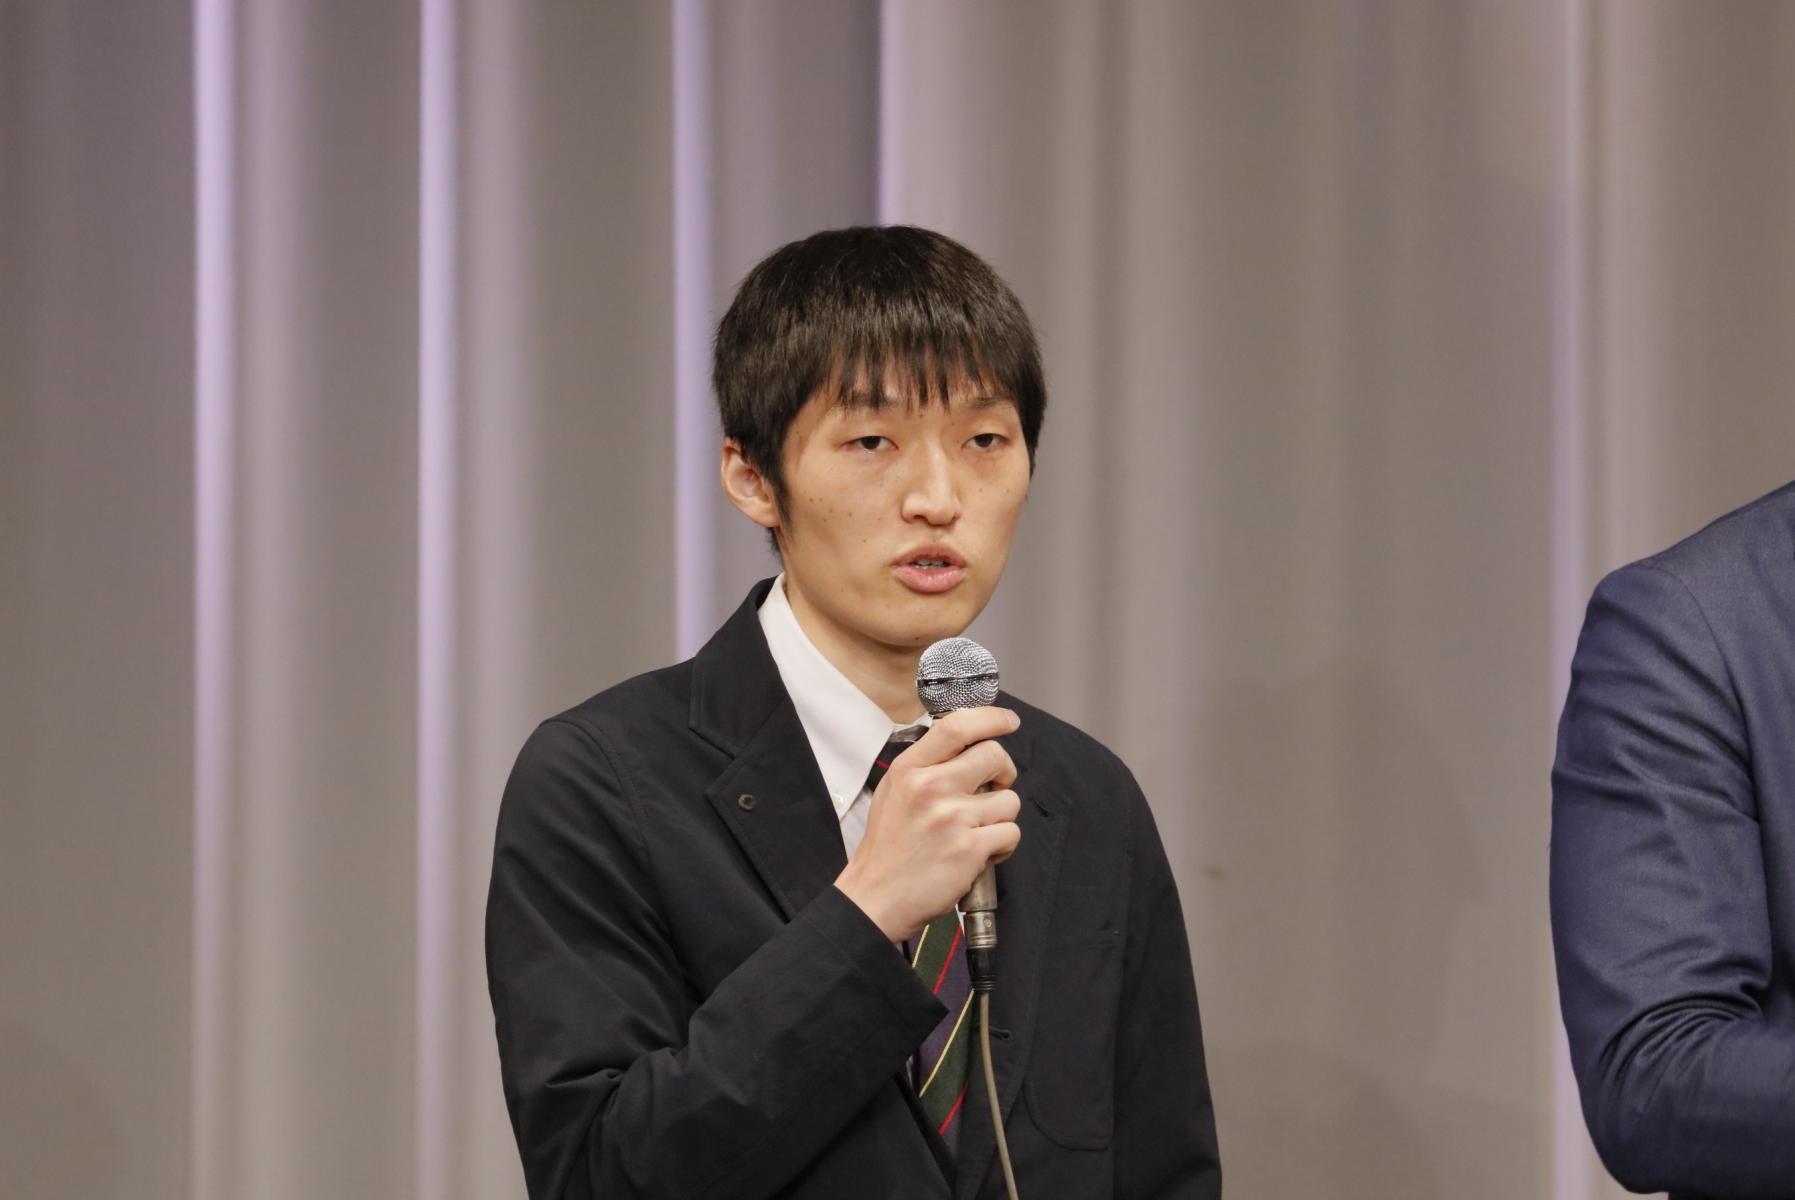 http://news.yoshimoto.co.jp/20180314164228-c20c4da150651ceb746bc511a0901260606123ca.jpg